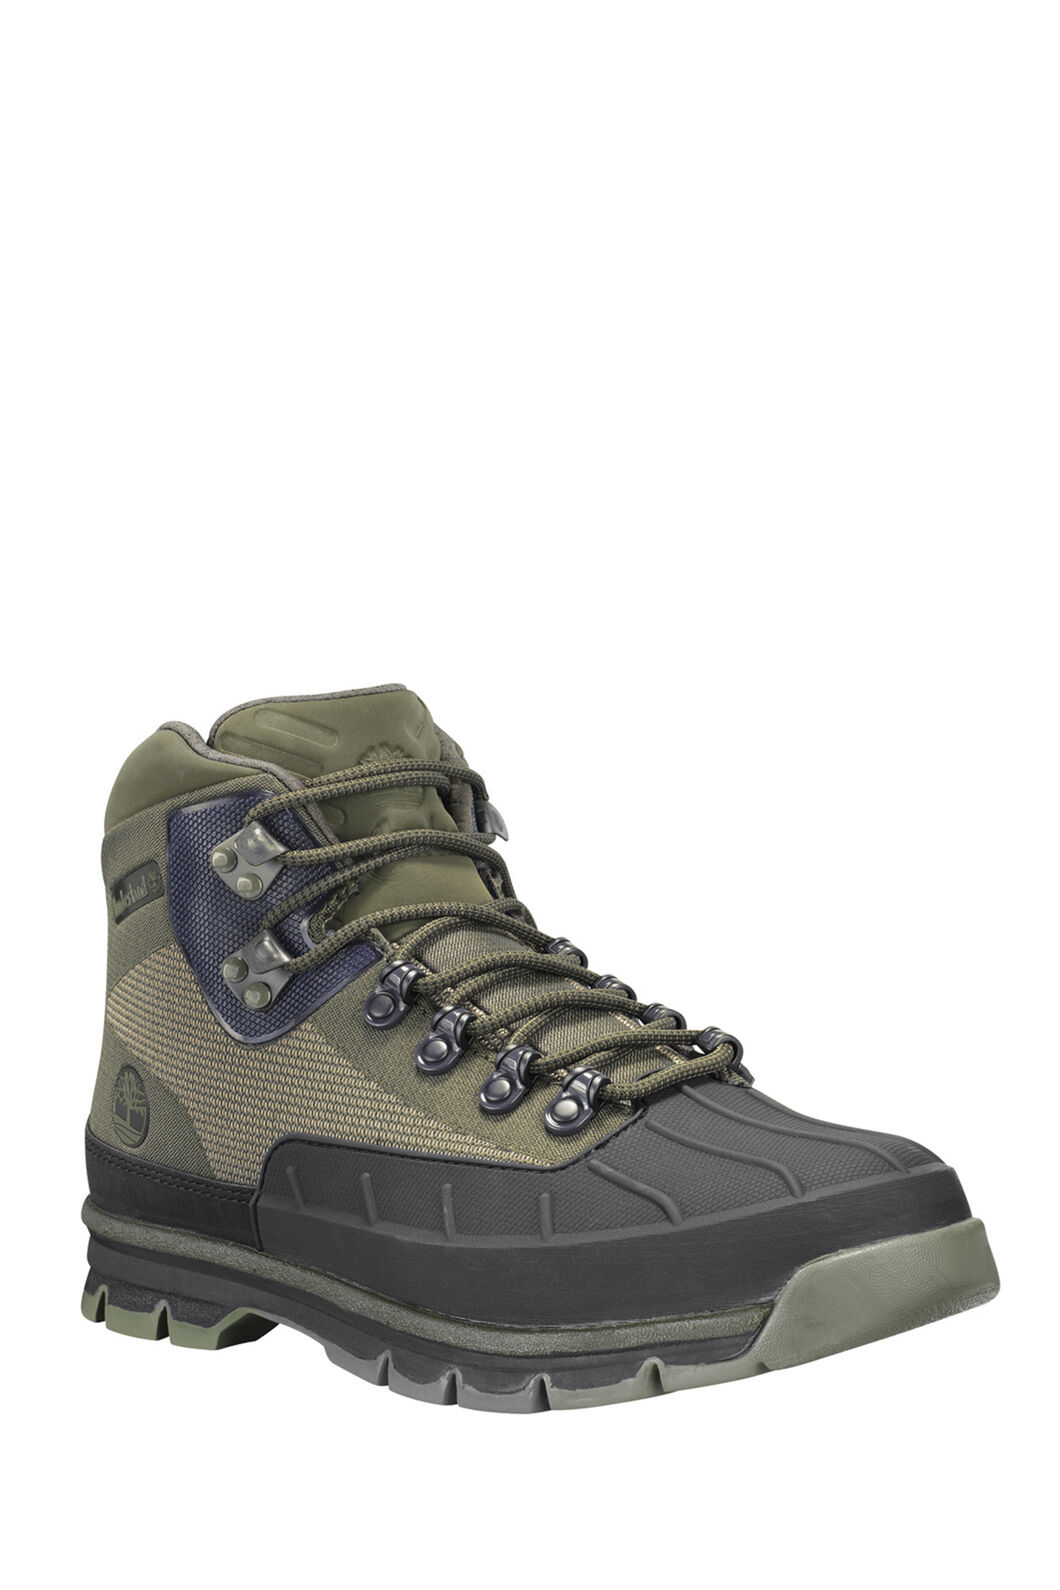 Timberland Men's Euro Hiker Shell-Toe Boots, DARK GREEN JAQUARD, hi-res